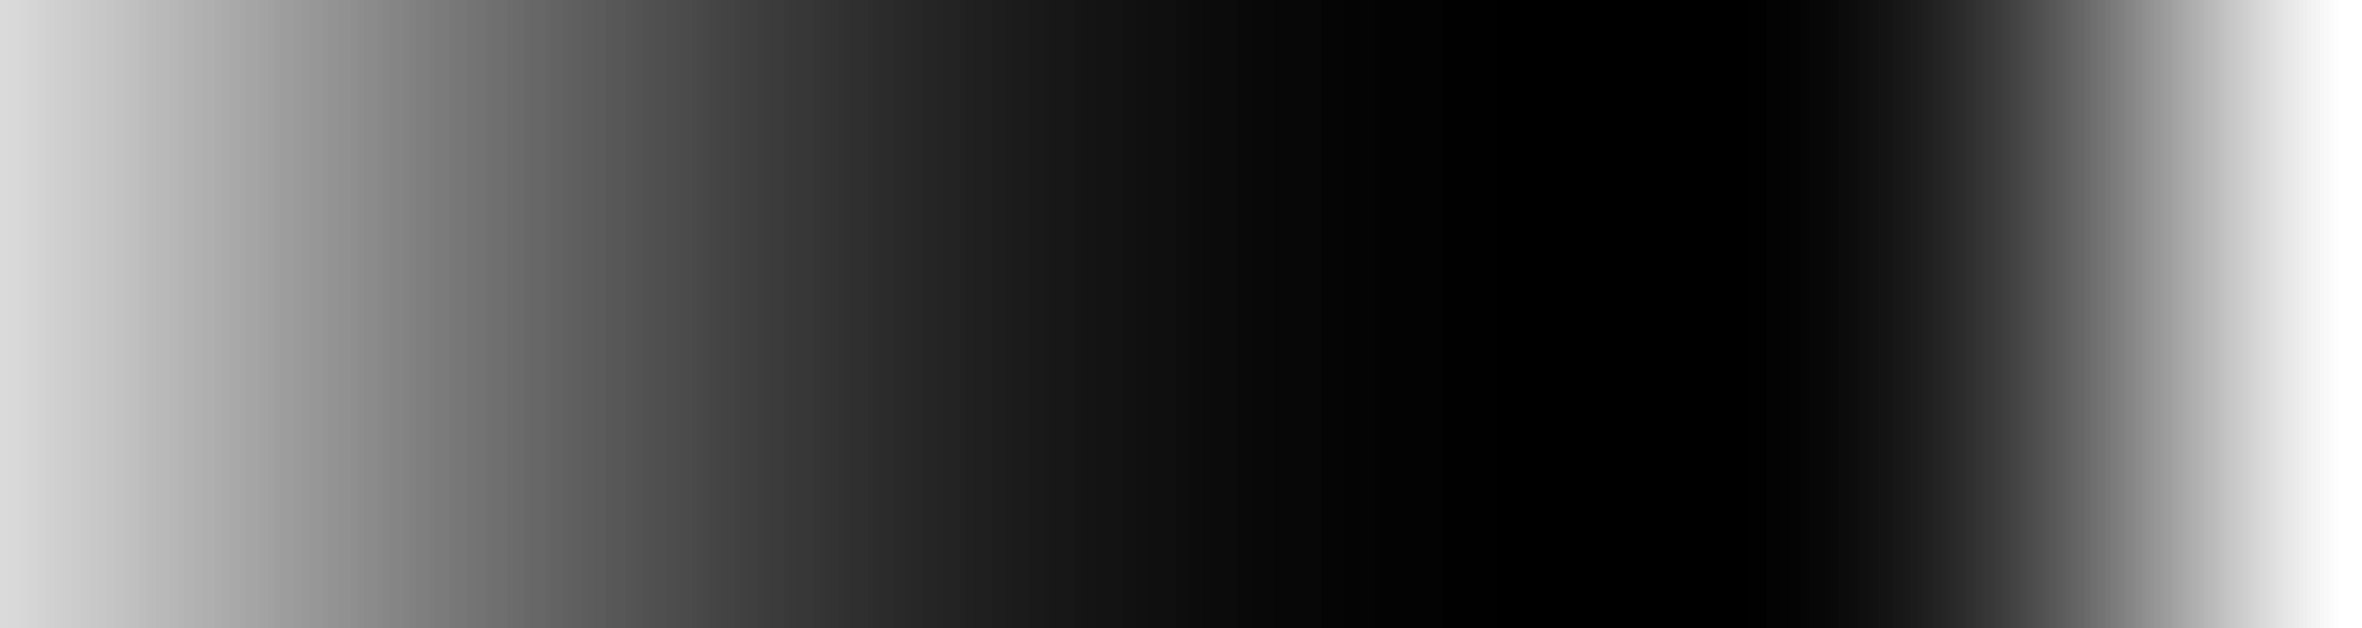 slide-gradient